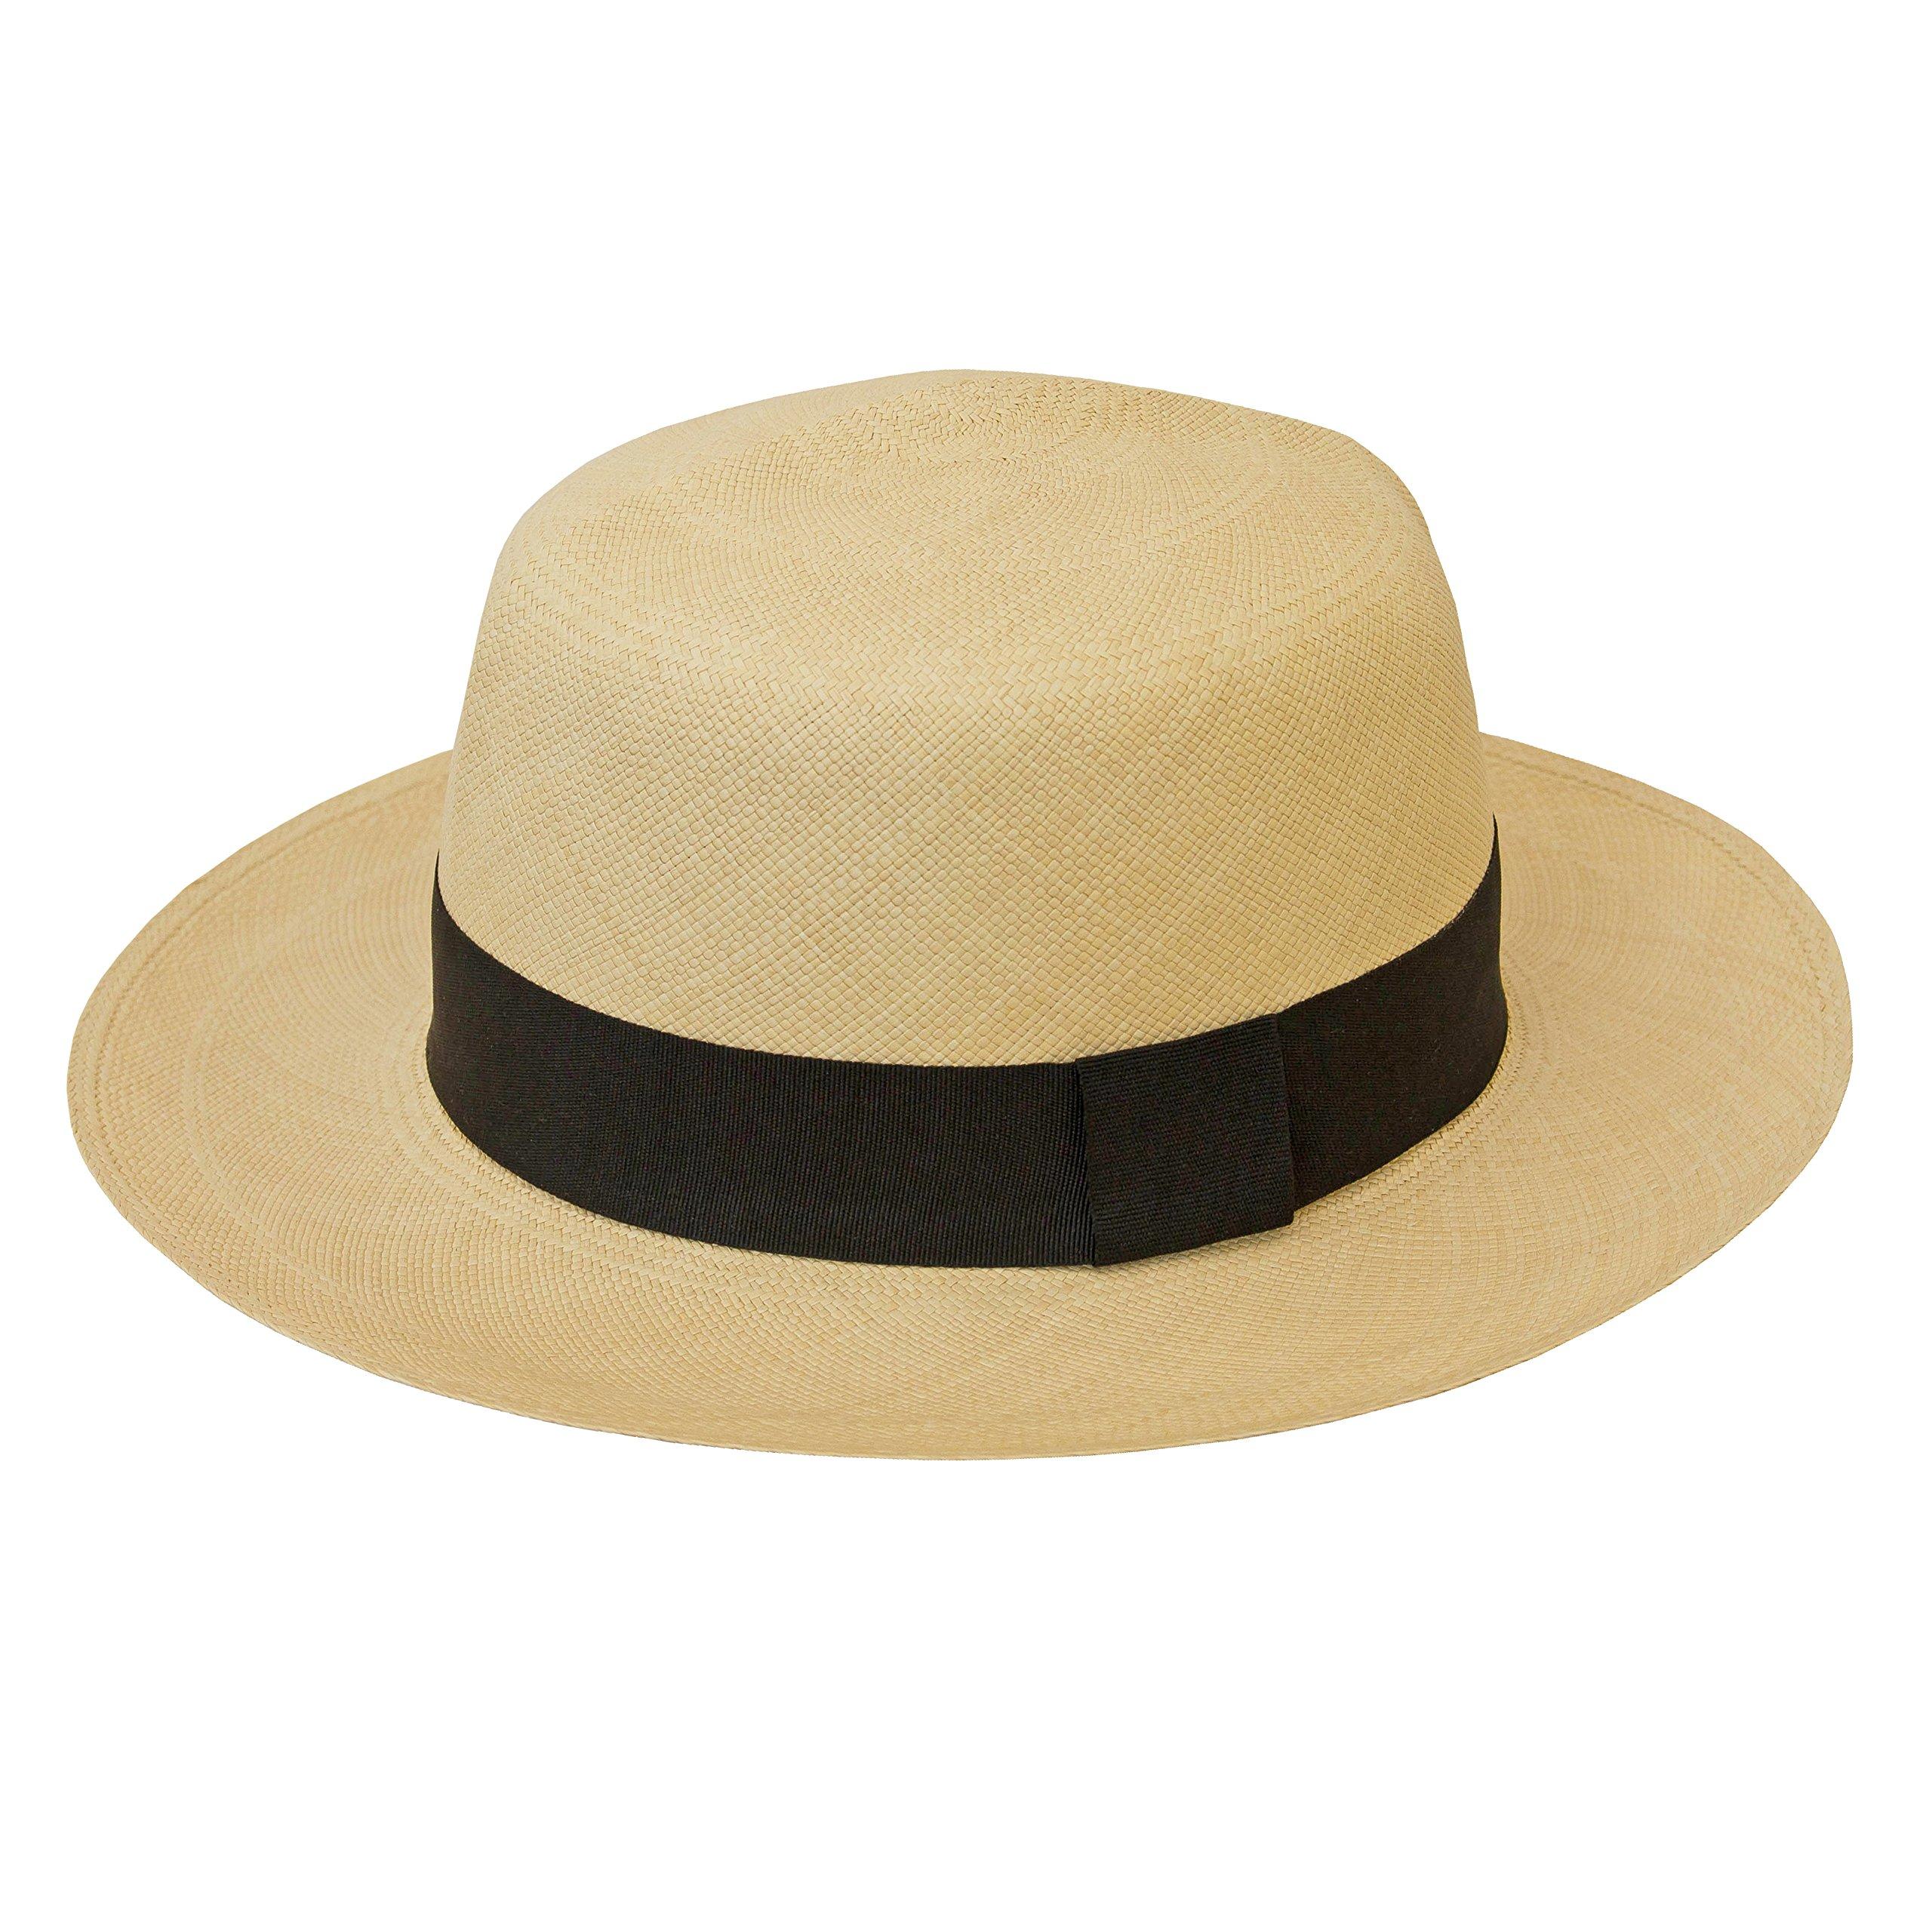 Tumia - Fino Colonial/Folder Style Panama - Premium Quality - Natural with Black Band. 60cm. by Tumia Panama Hats (Image #2)